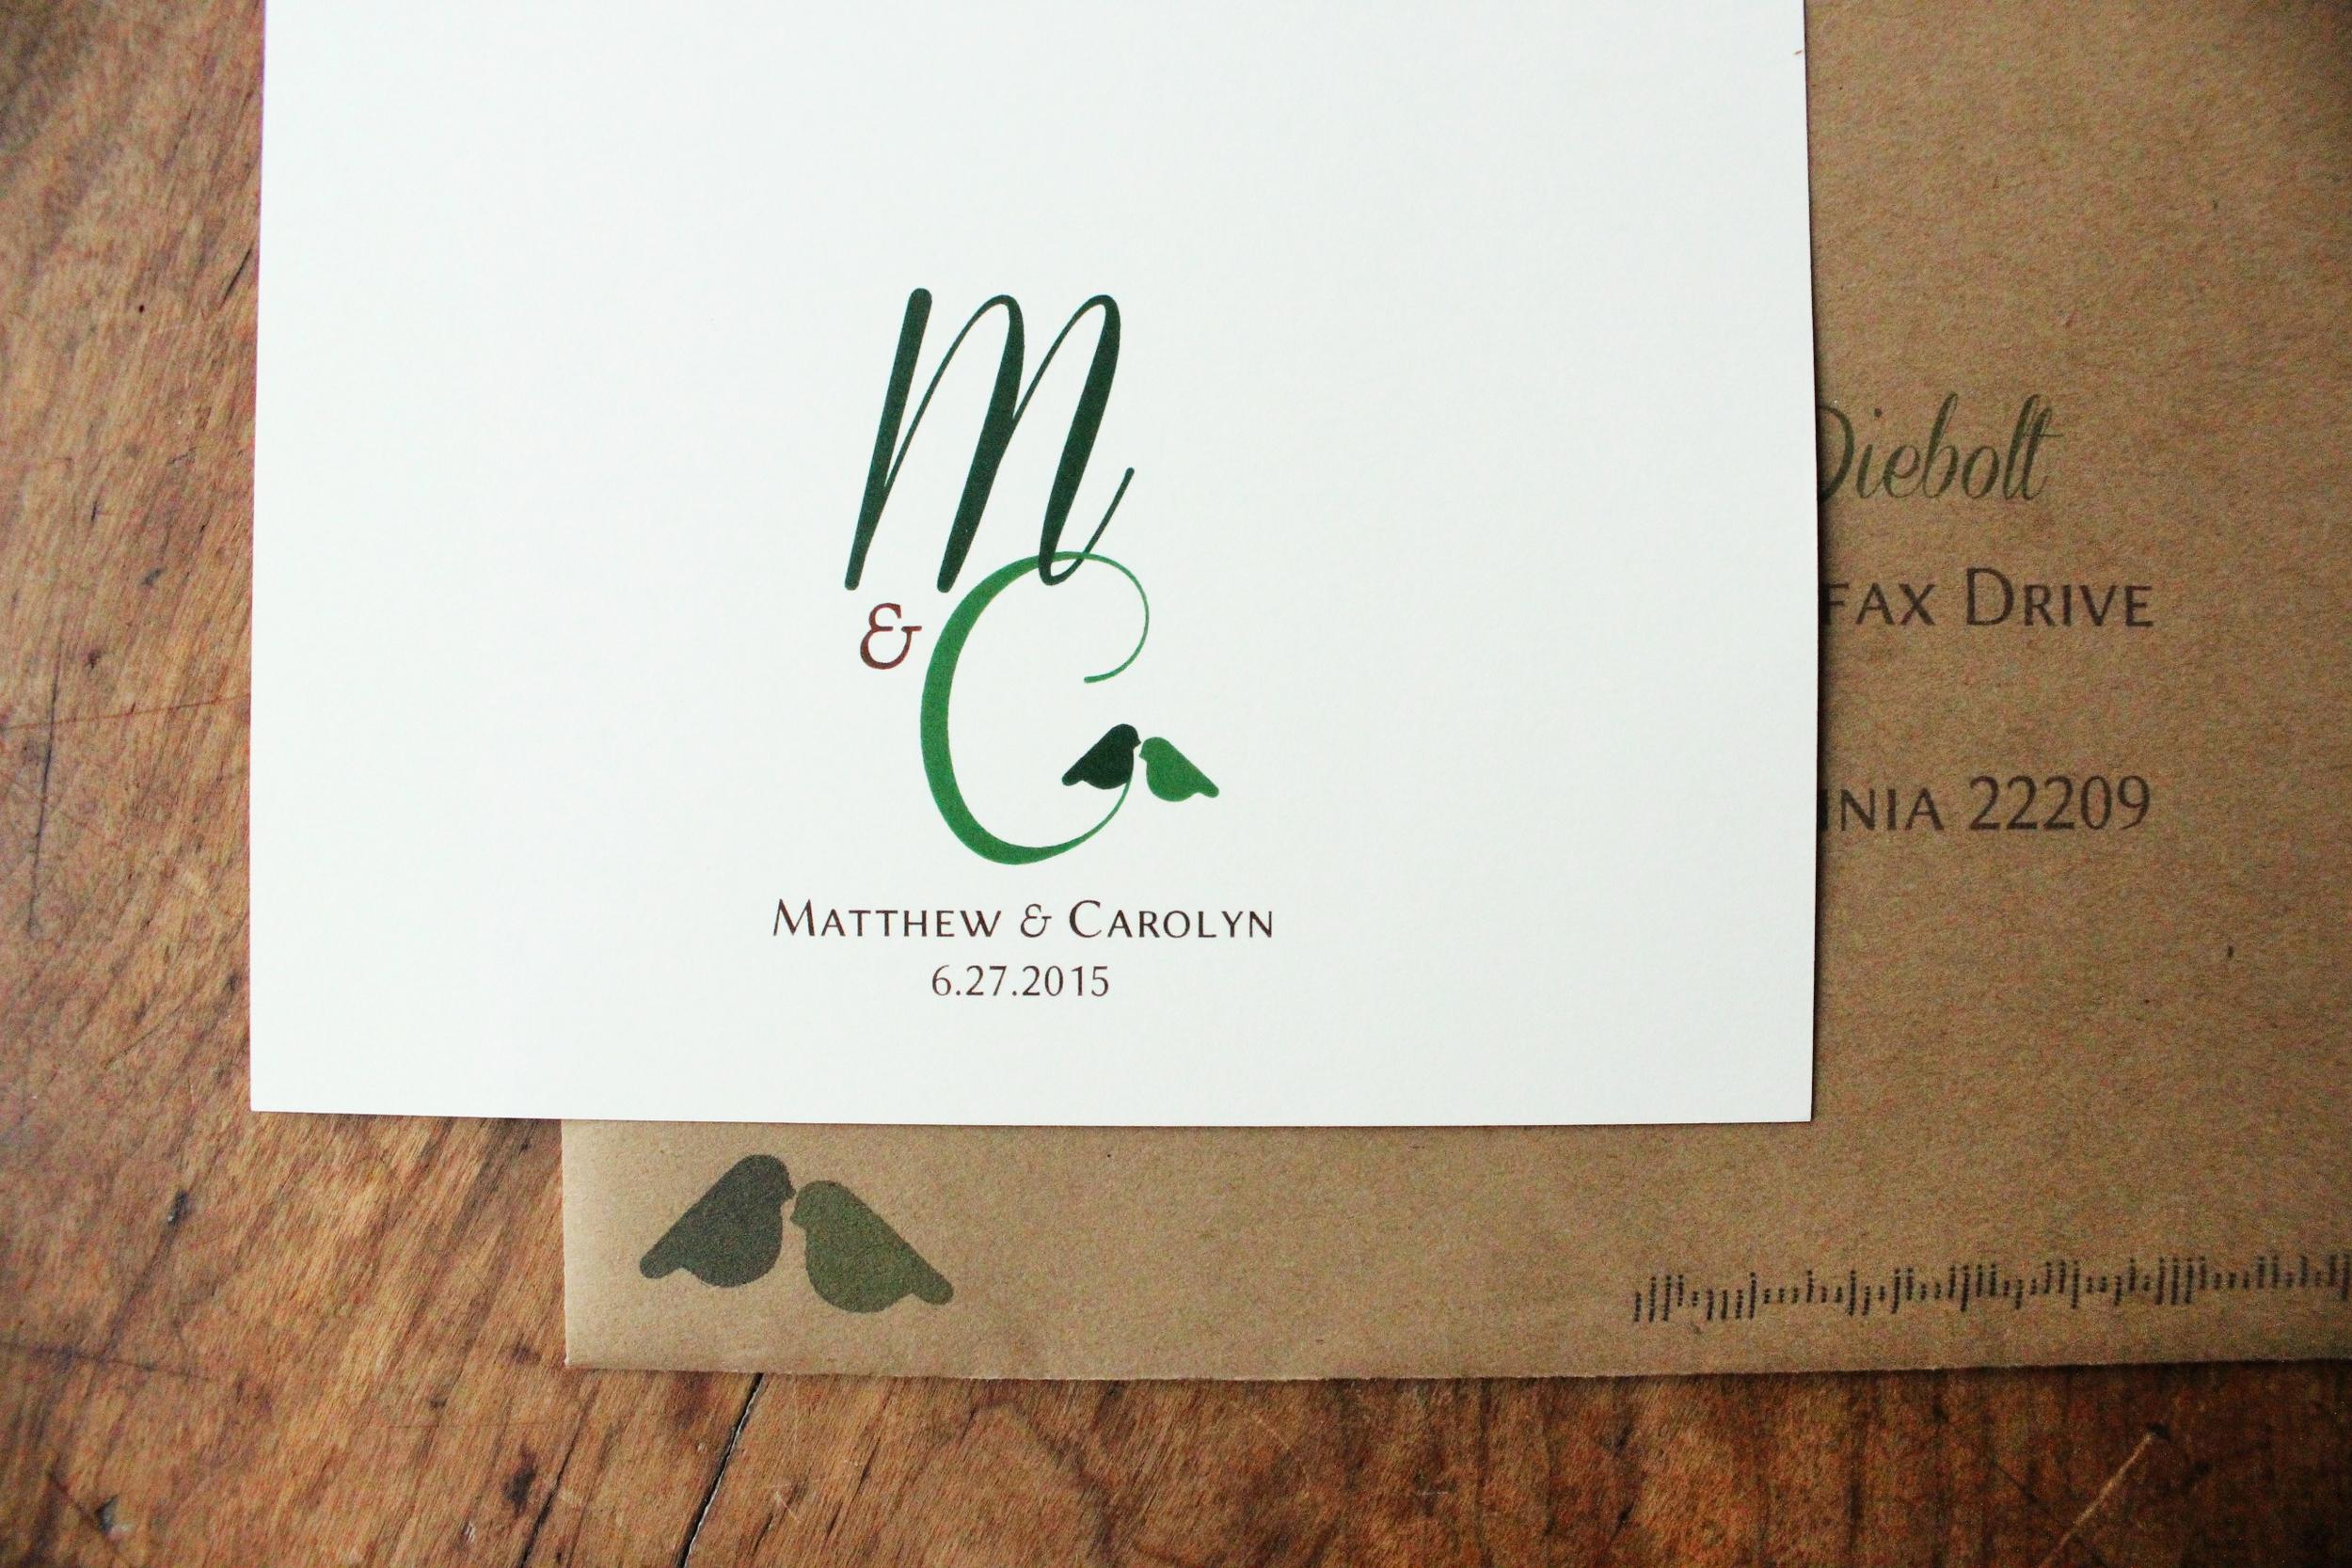 matt & carolyn   logo & addressed envelopes